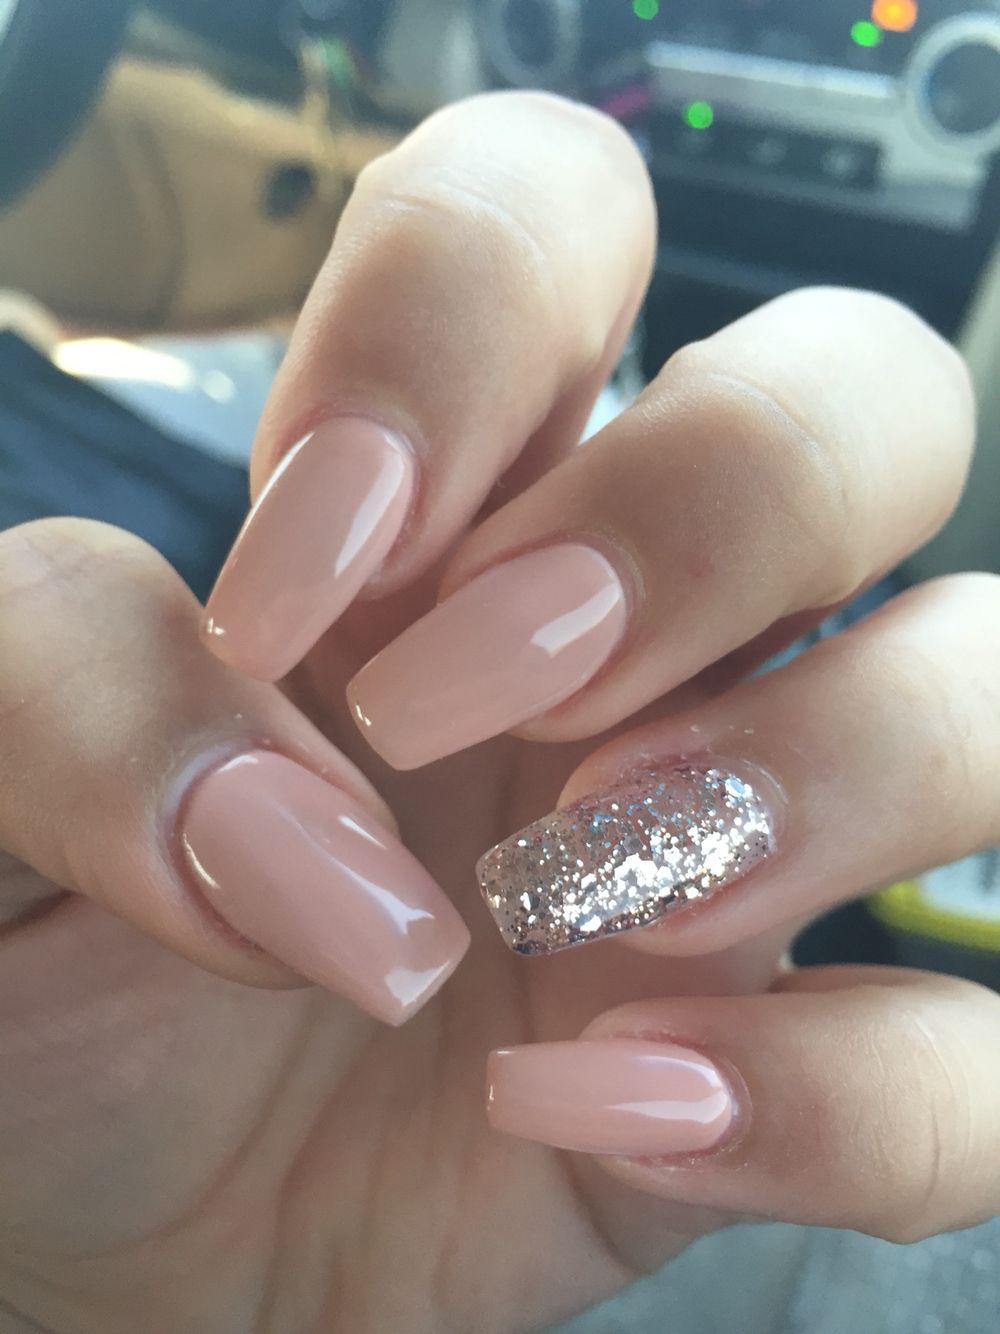 Acrylic and shellac coffin nails | Nail stuff | Pinterest ...